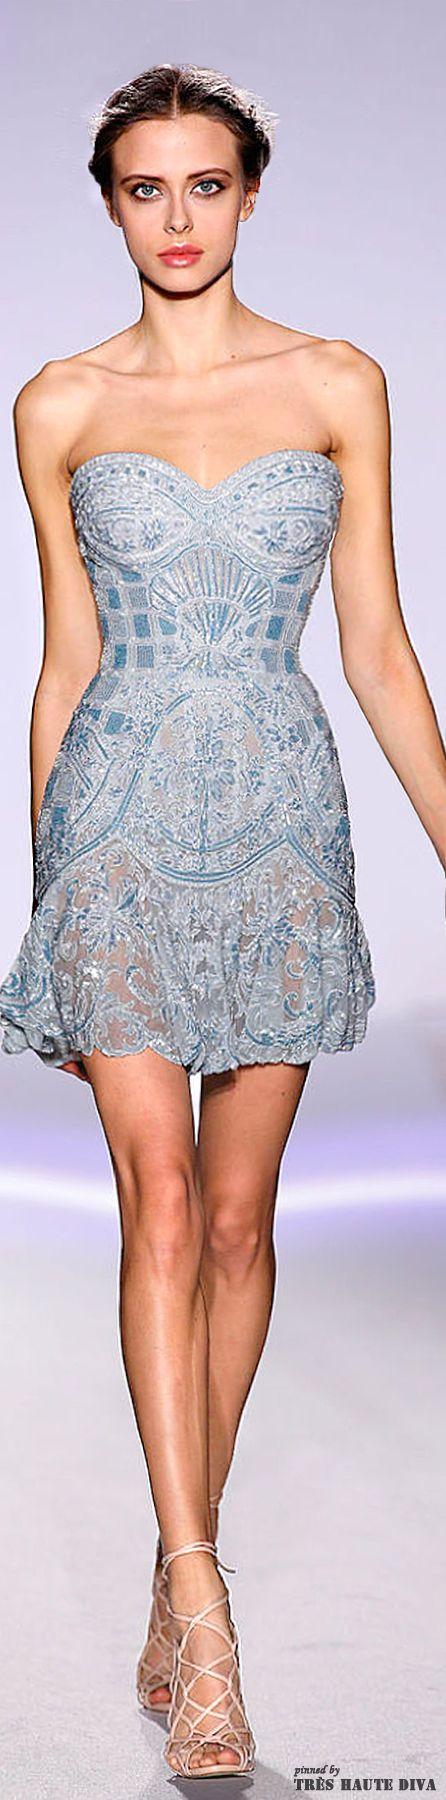 Zuhair Murad Spring 2013 Haute Couture Collection